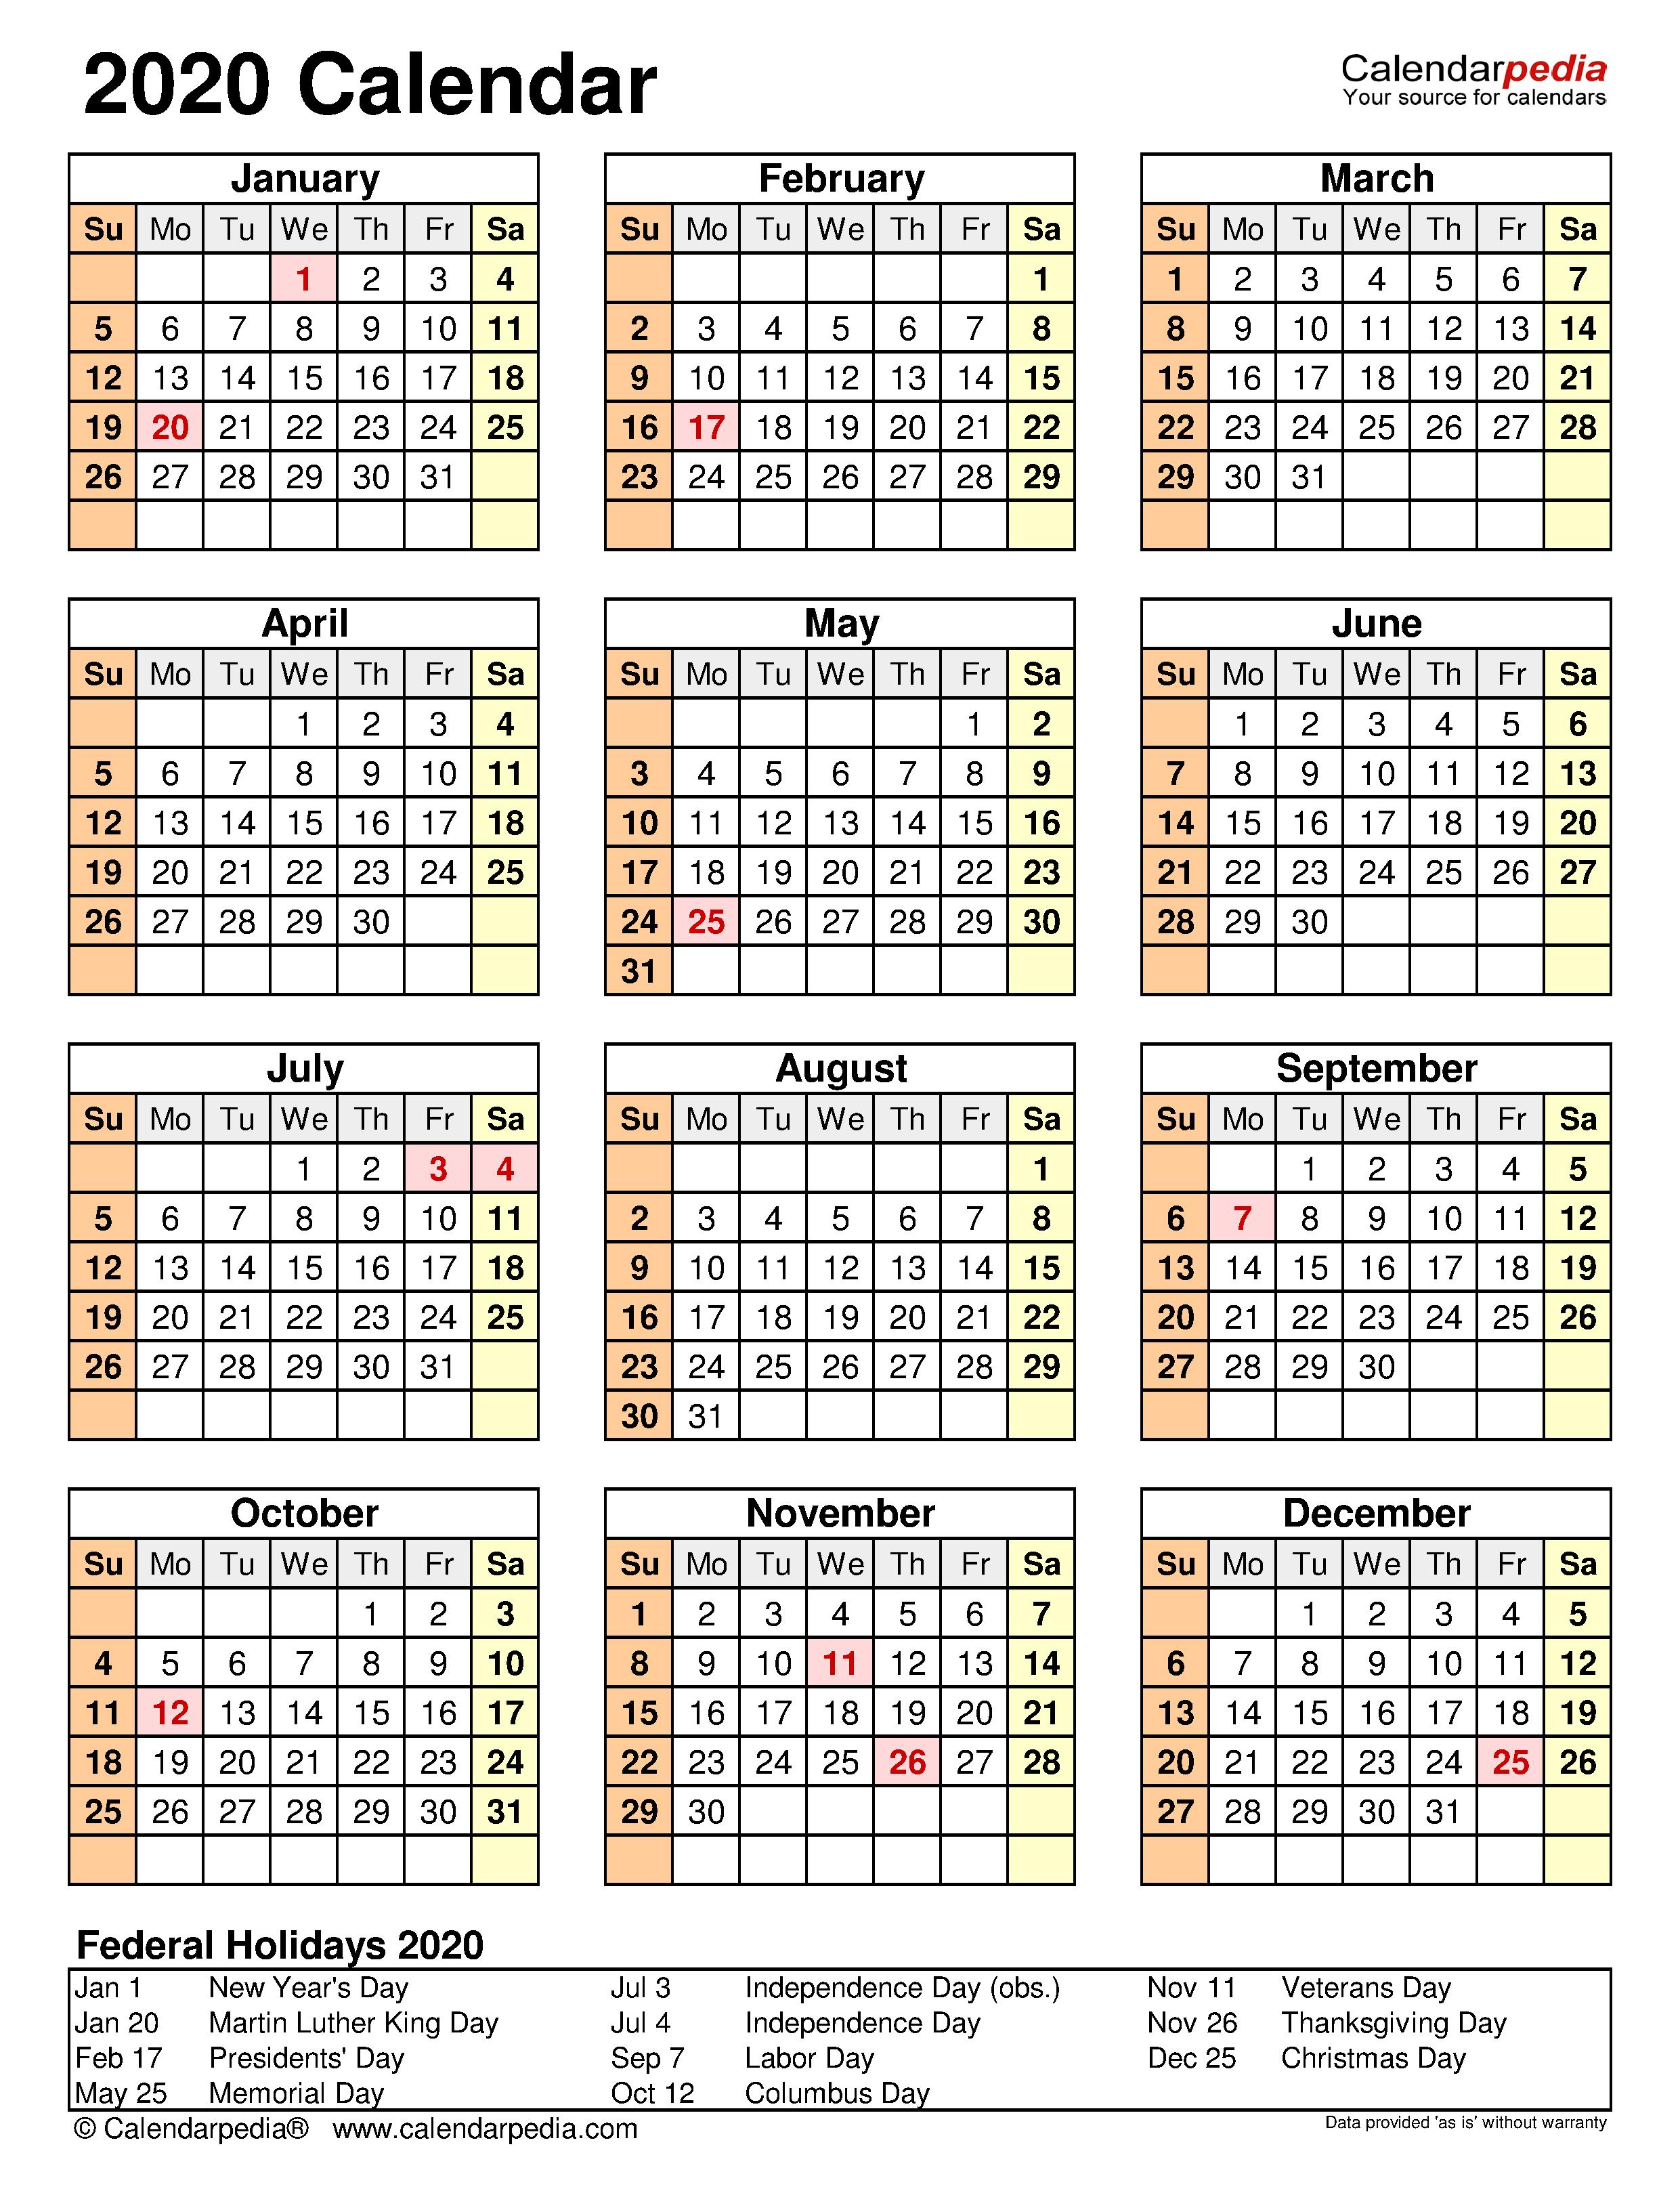 2022 Attendance Calendar Printable Free.2020 Calendar Free Printable Word Templates Calendarpedia